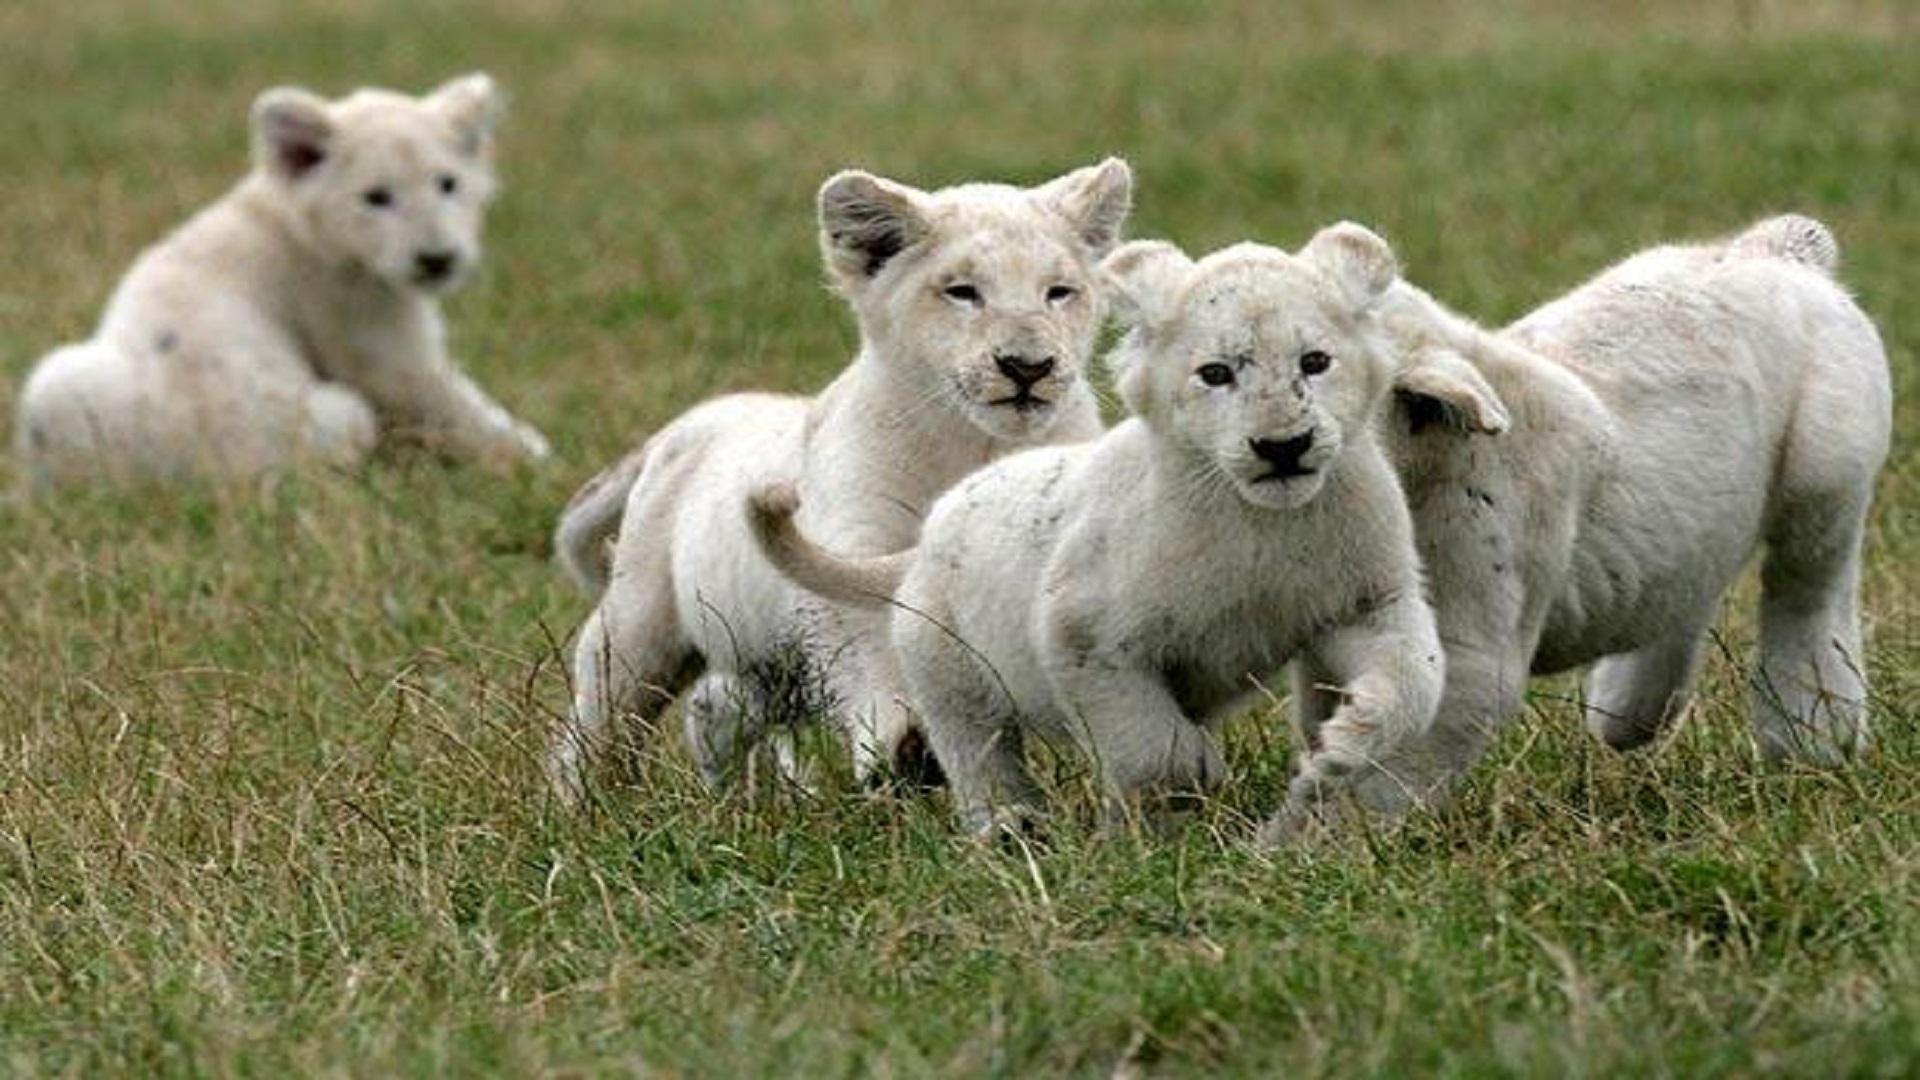 Lions Running Most Beautiful Hd Free Wallpapers Hd Wallpaper